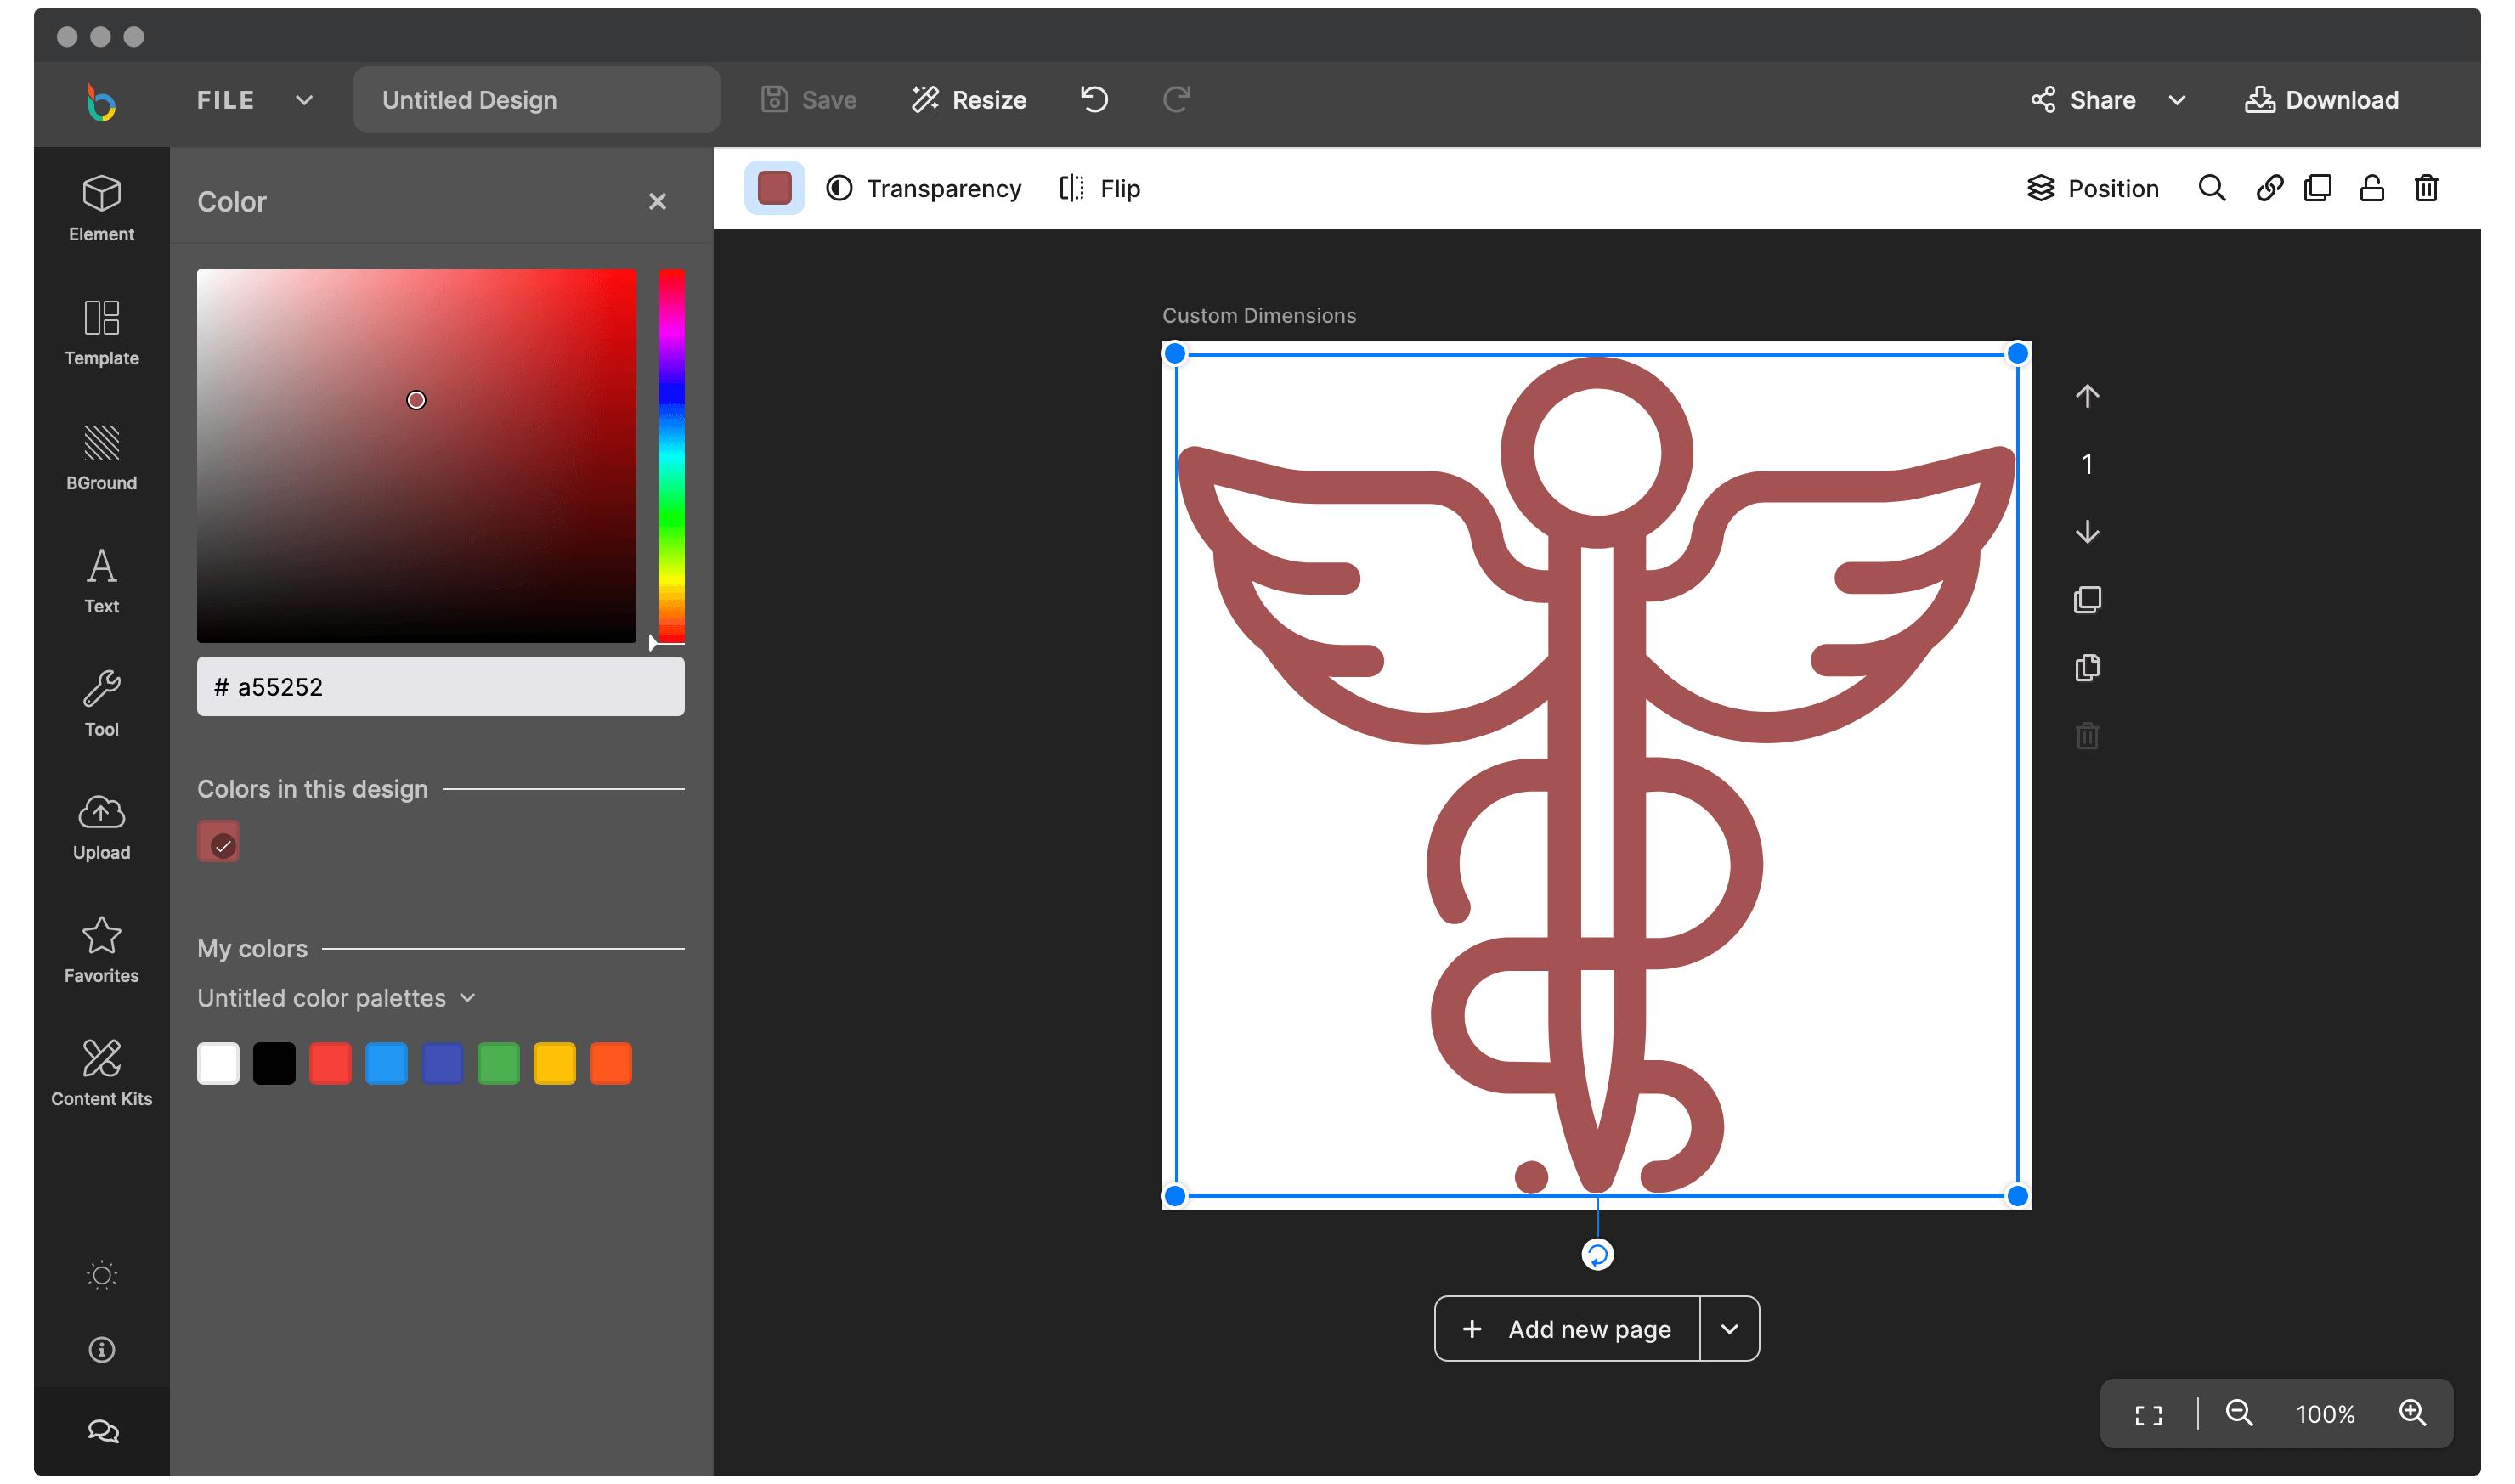 The DesignBold app.